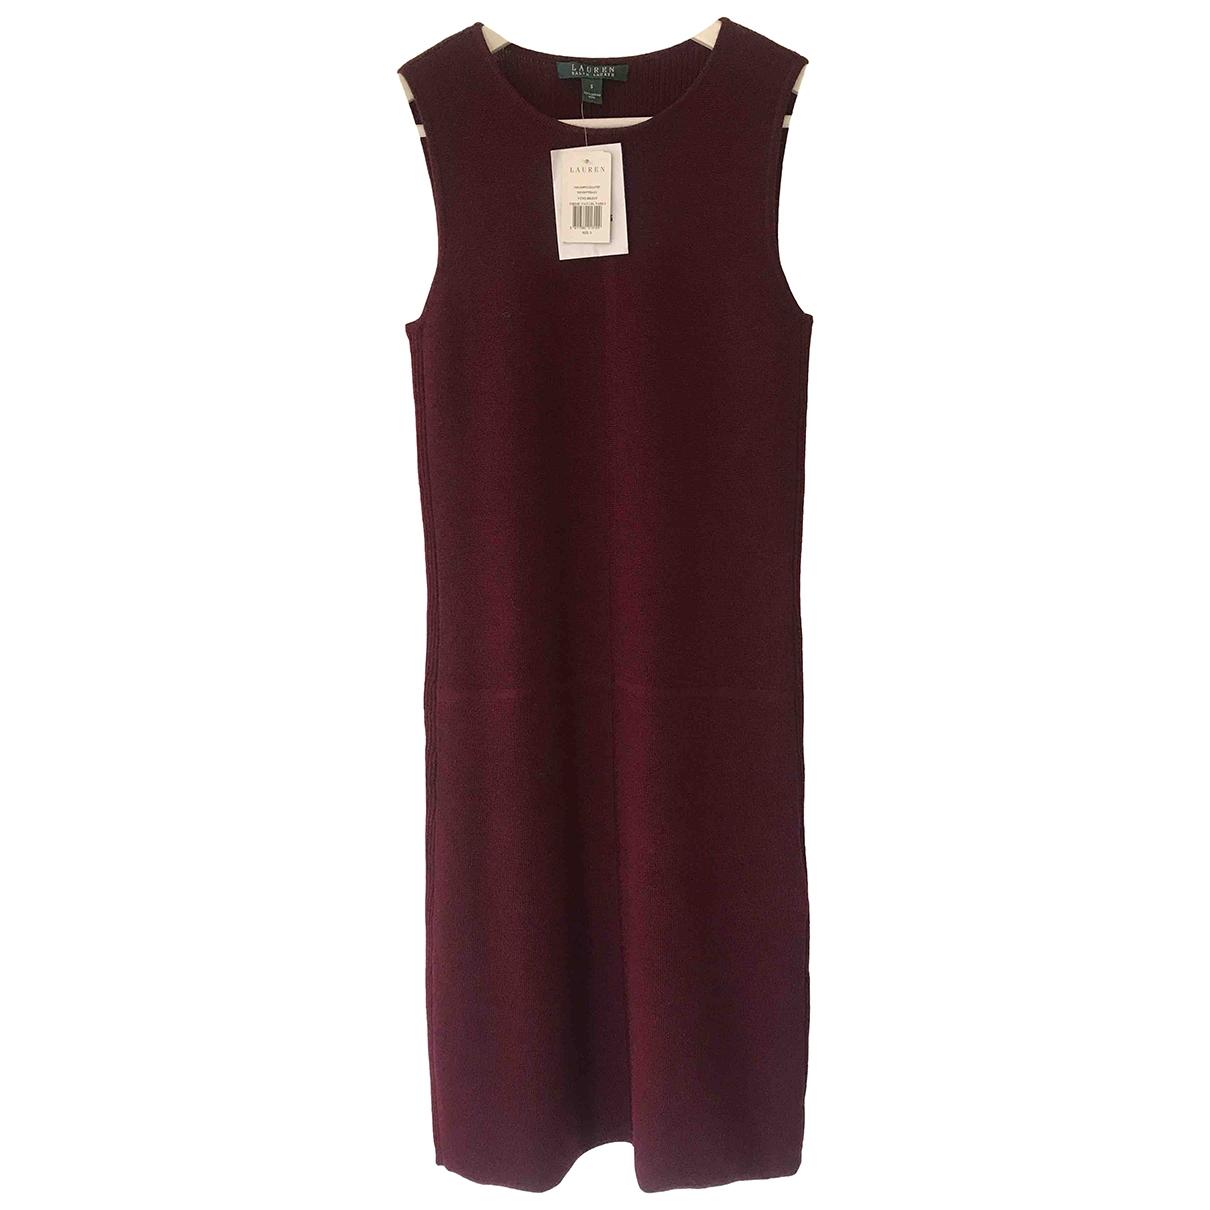 Lauren Ralph Lauren \N Burgundy Wool dress for Women S International